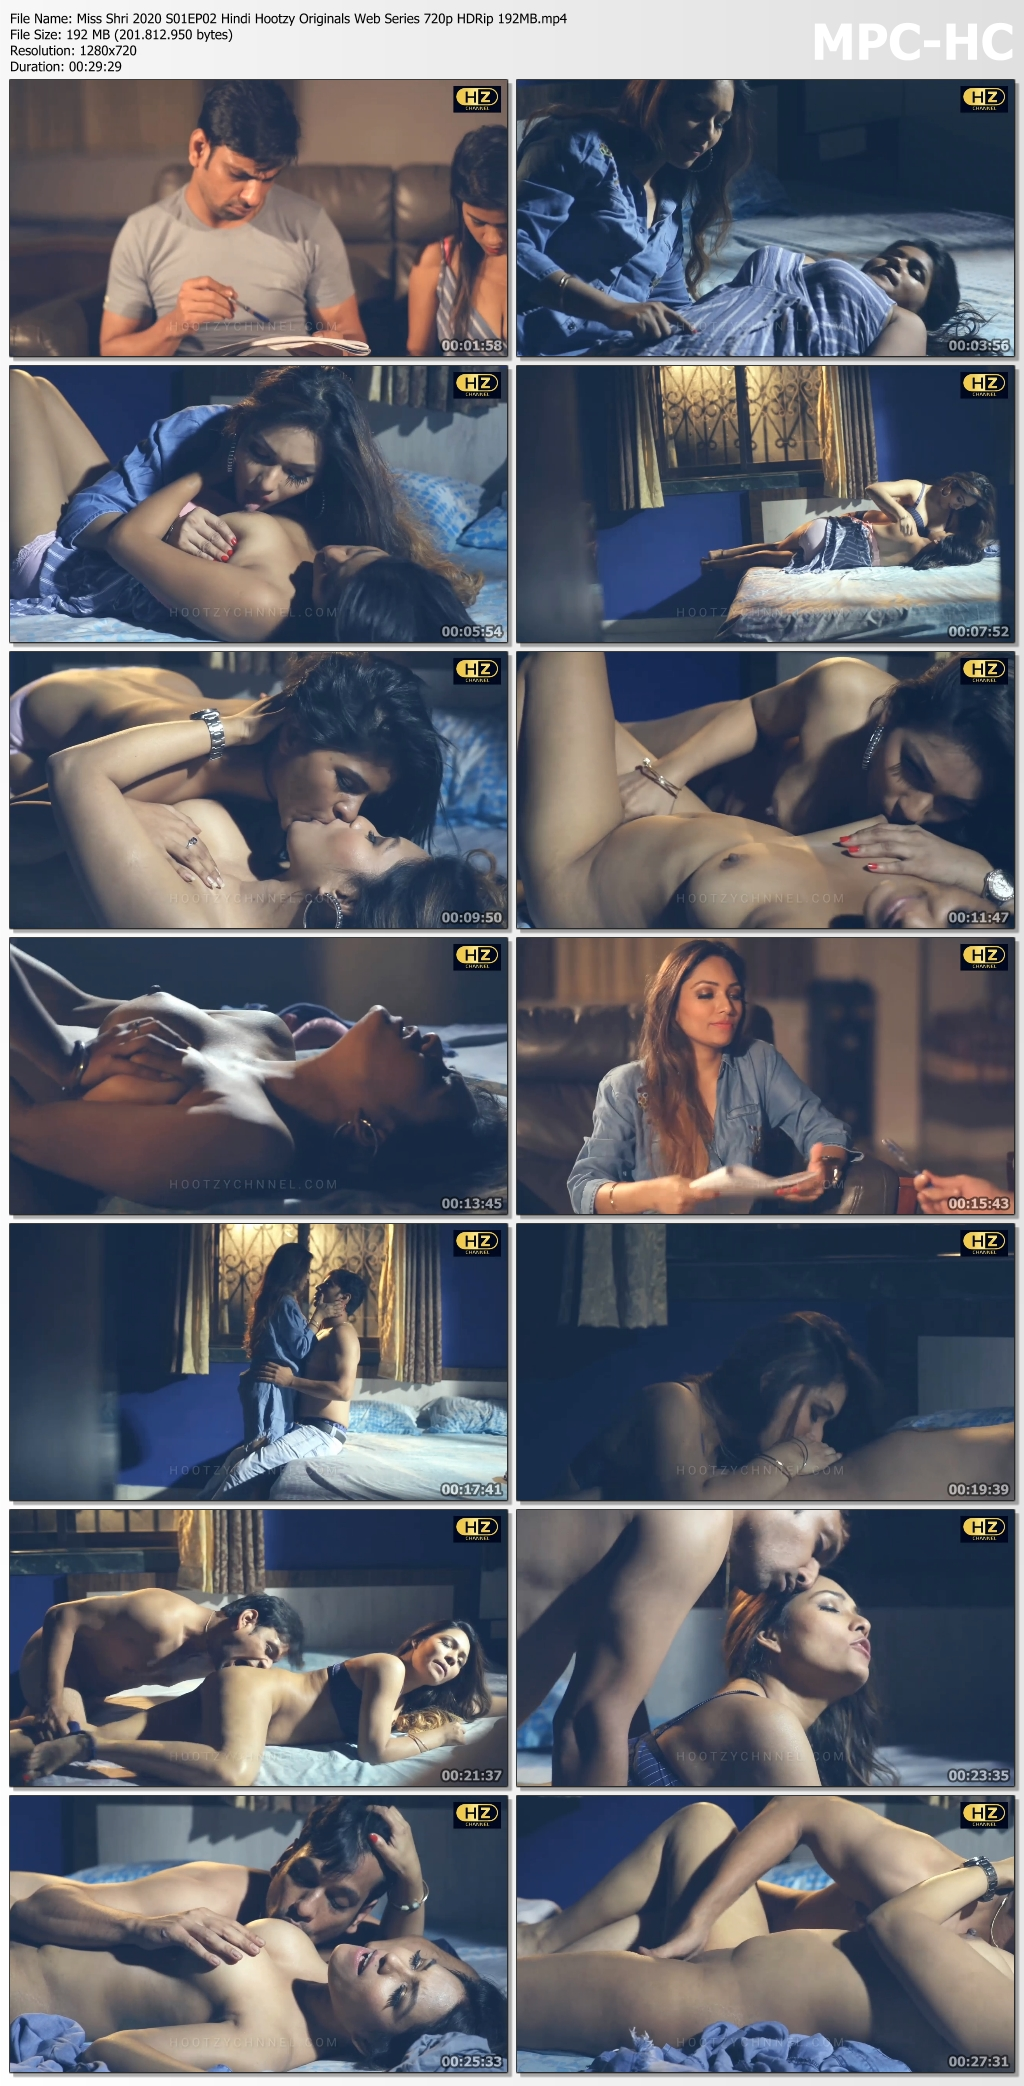 Miss-Shri-2020-S01-EP02-Hindi-Hootzy-Originals-Web-Series-720p-HDRip-192-MB-mp4-thumbs